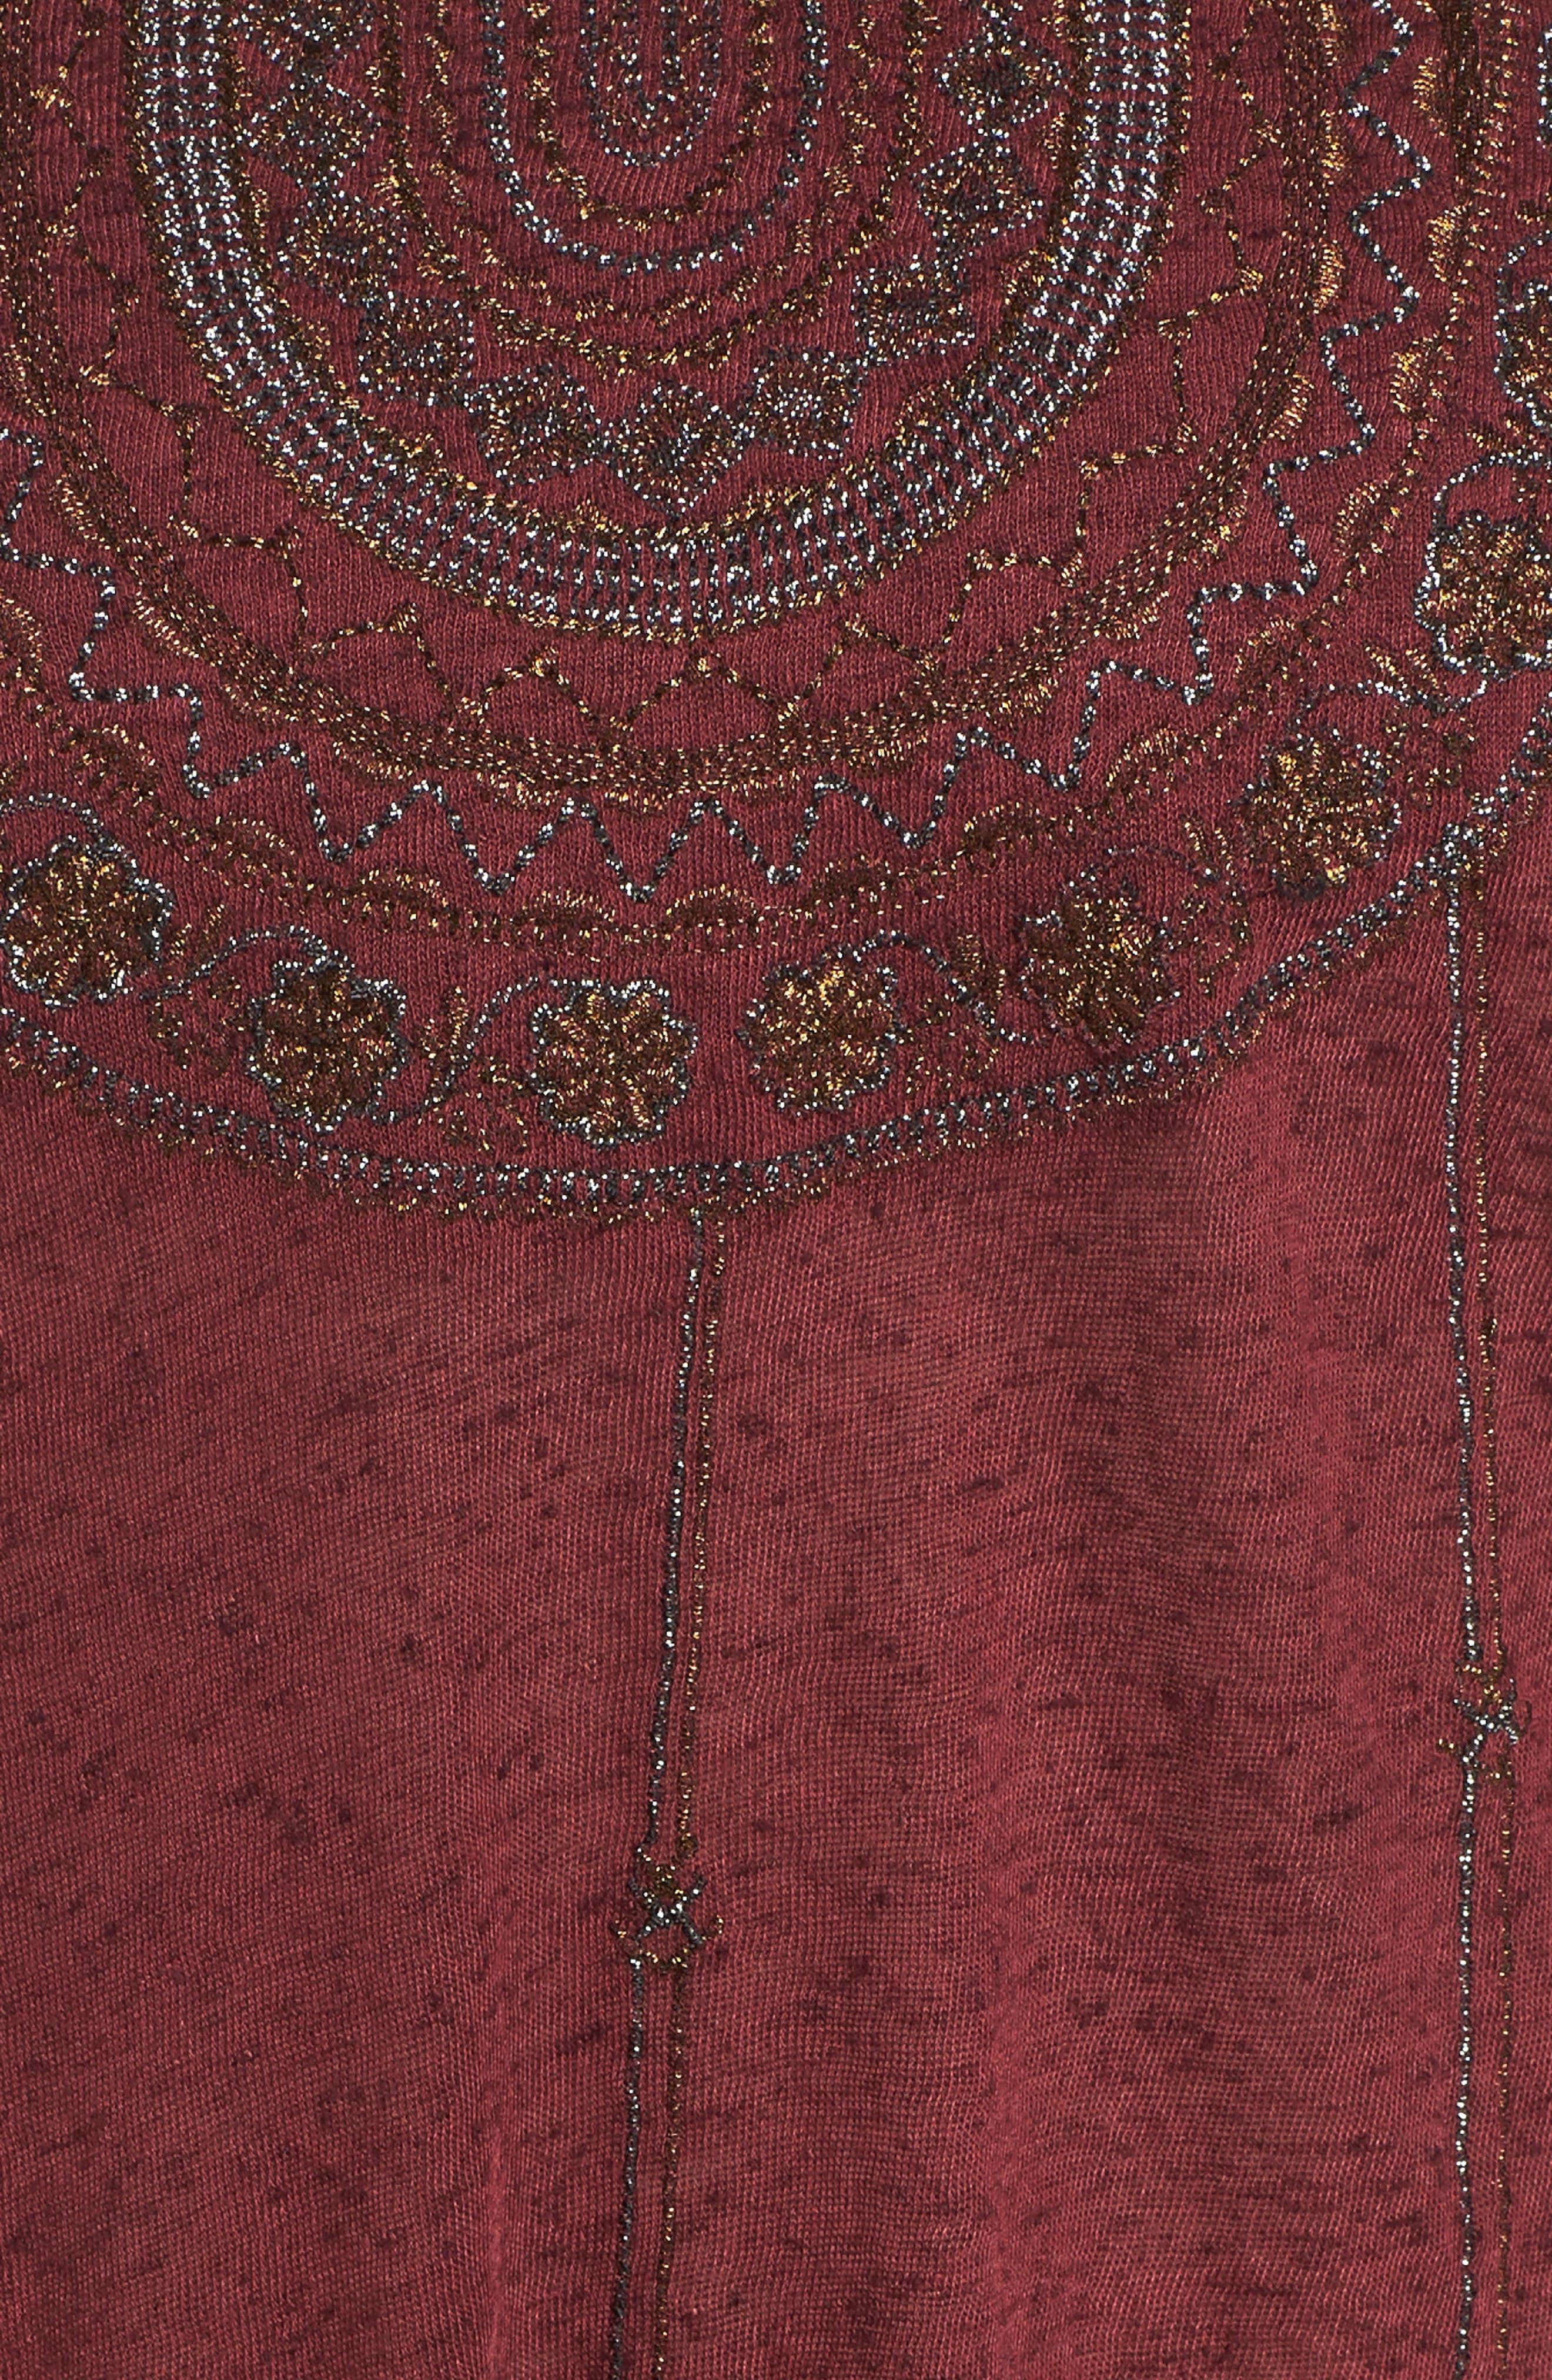 Embroidered Bib Top,                             Alternate thumbnail 5, color,                             Tawny Port